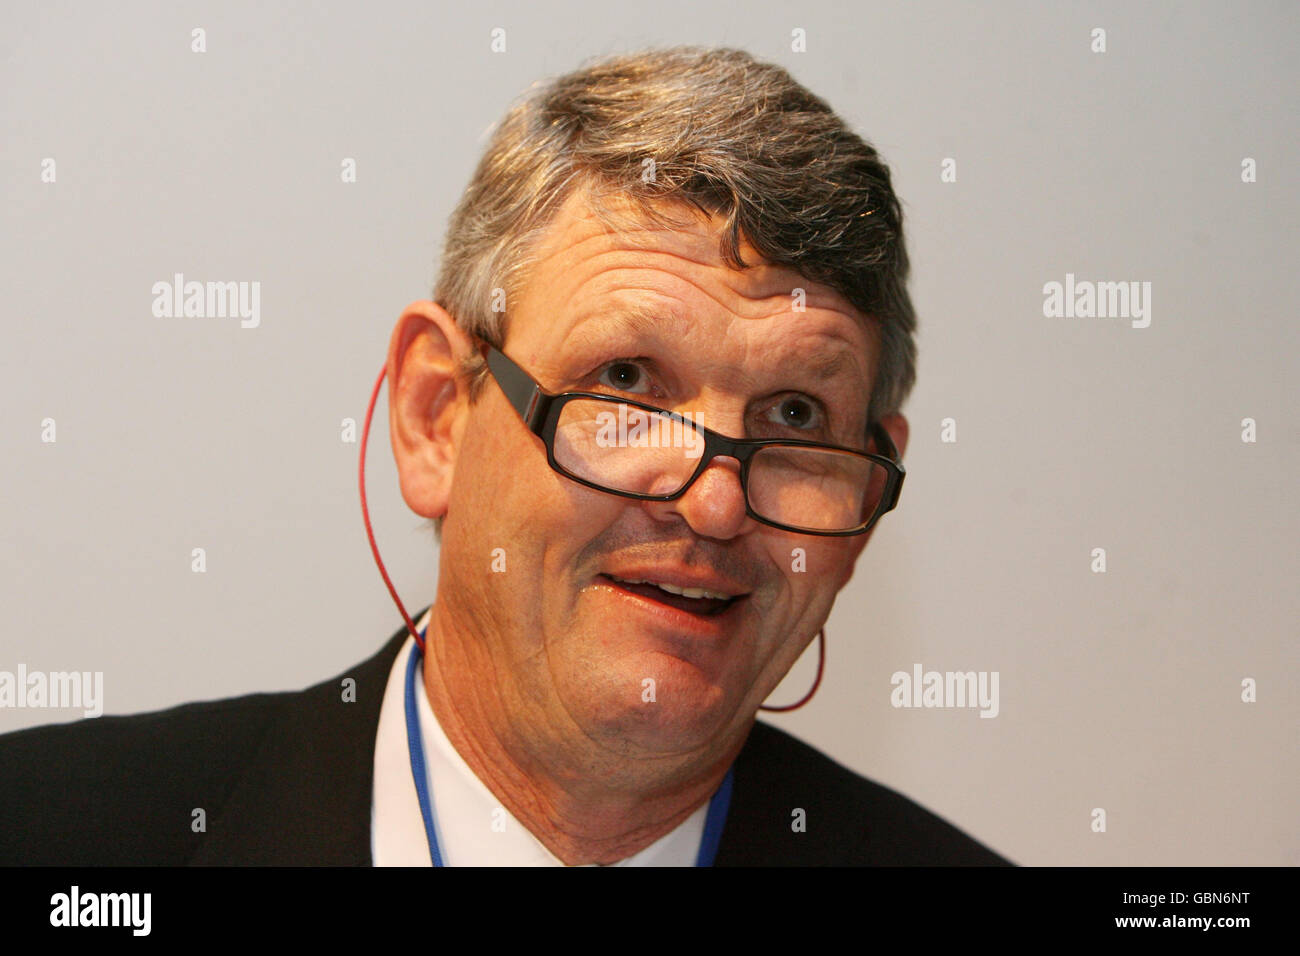 Morne Du Plessis Stock Photos & Morne Du Plessis Stock Images - Alamy